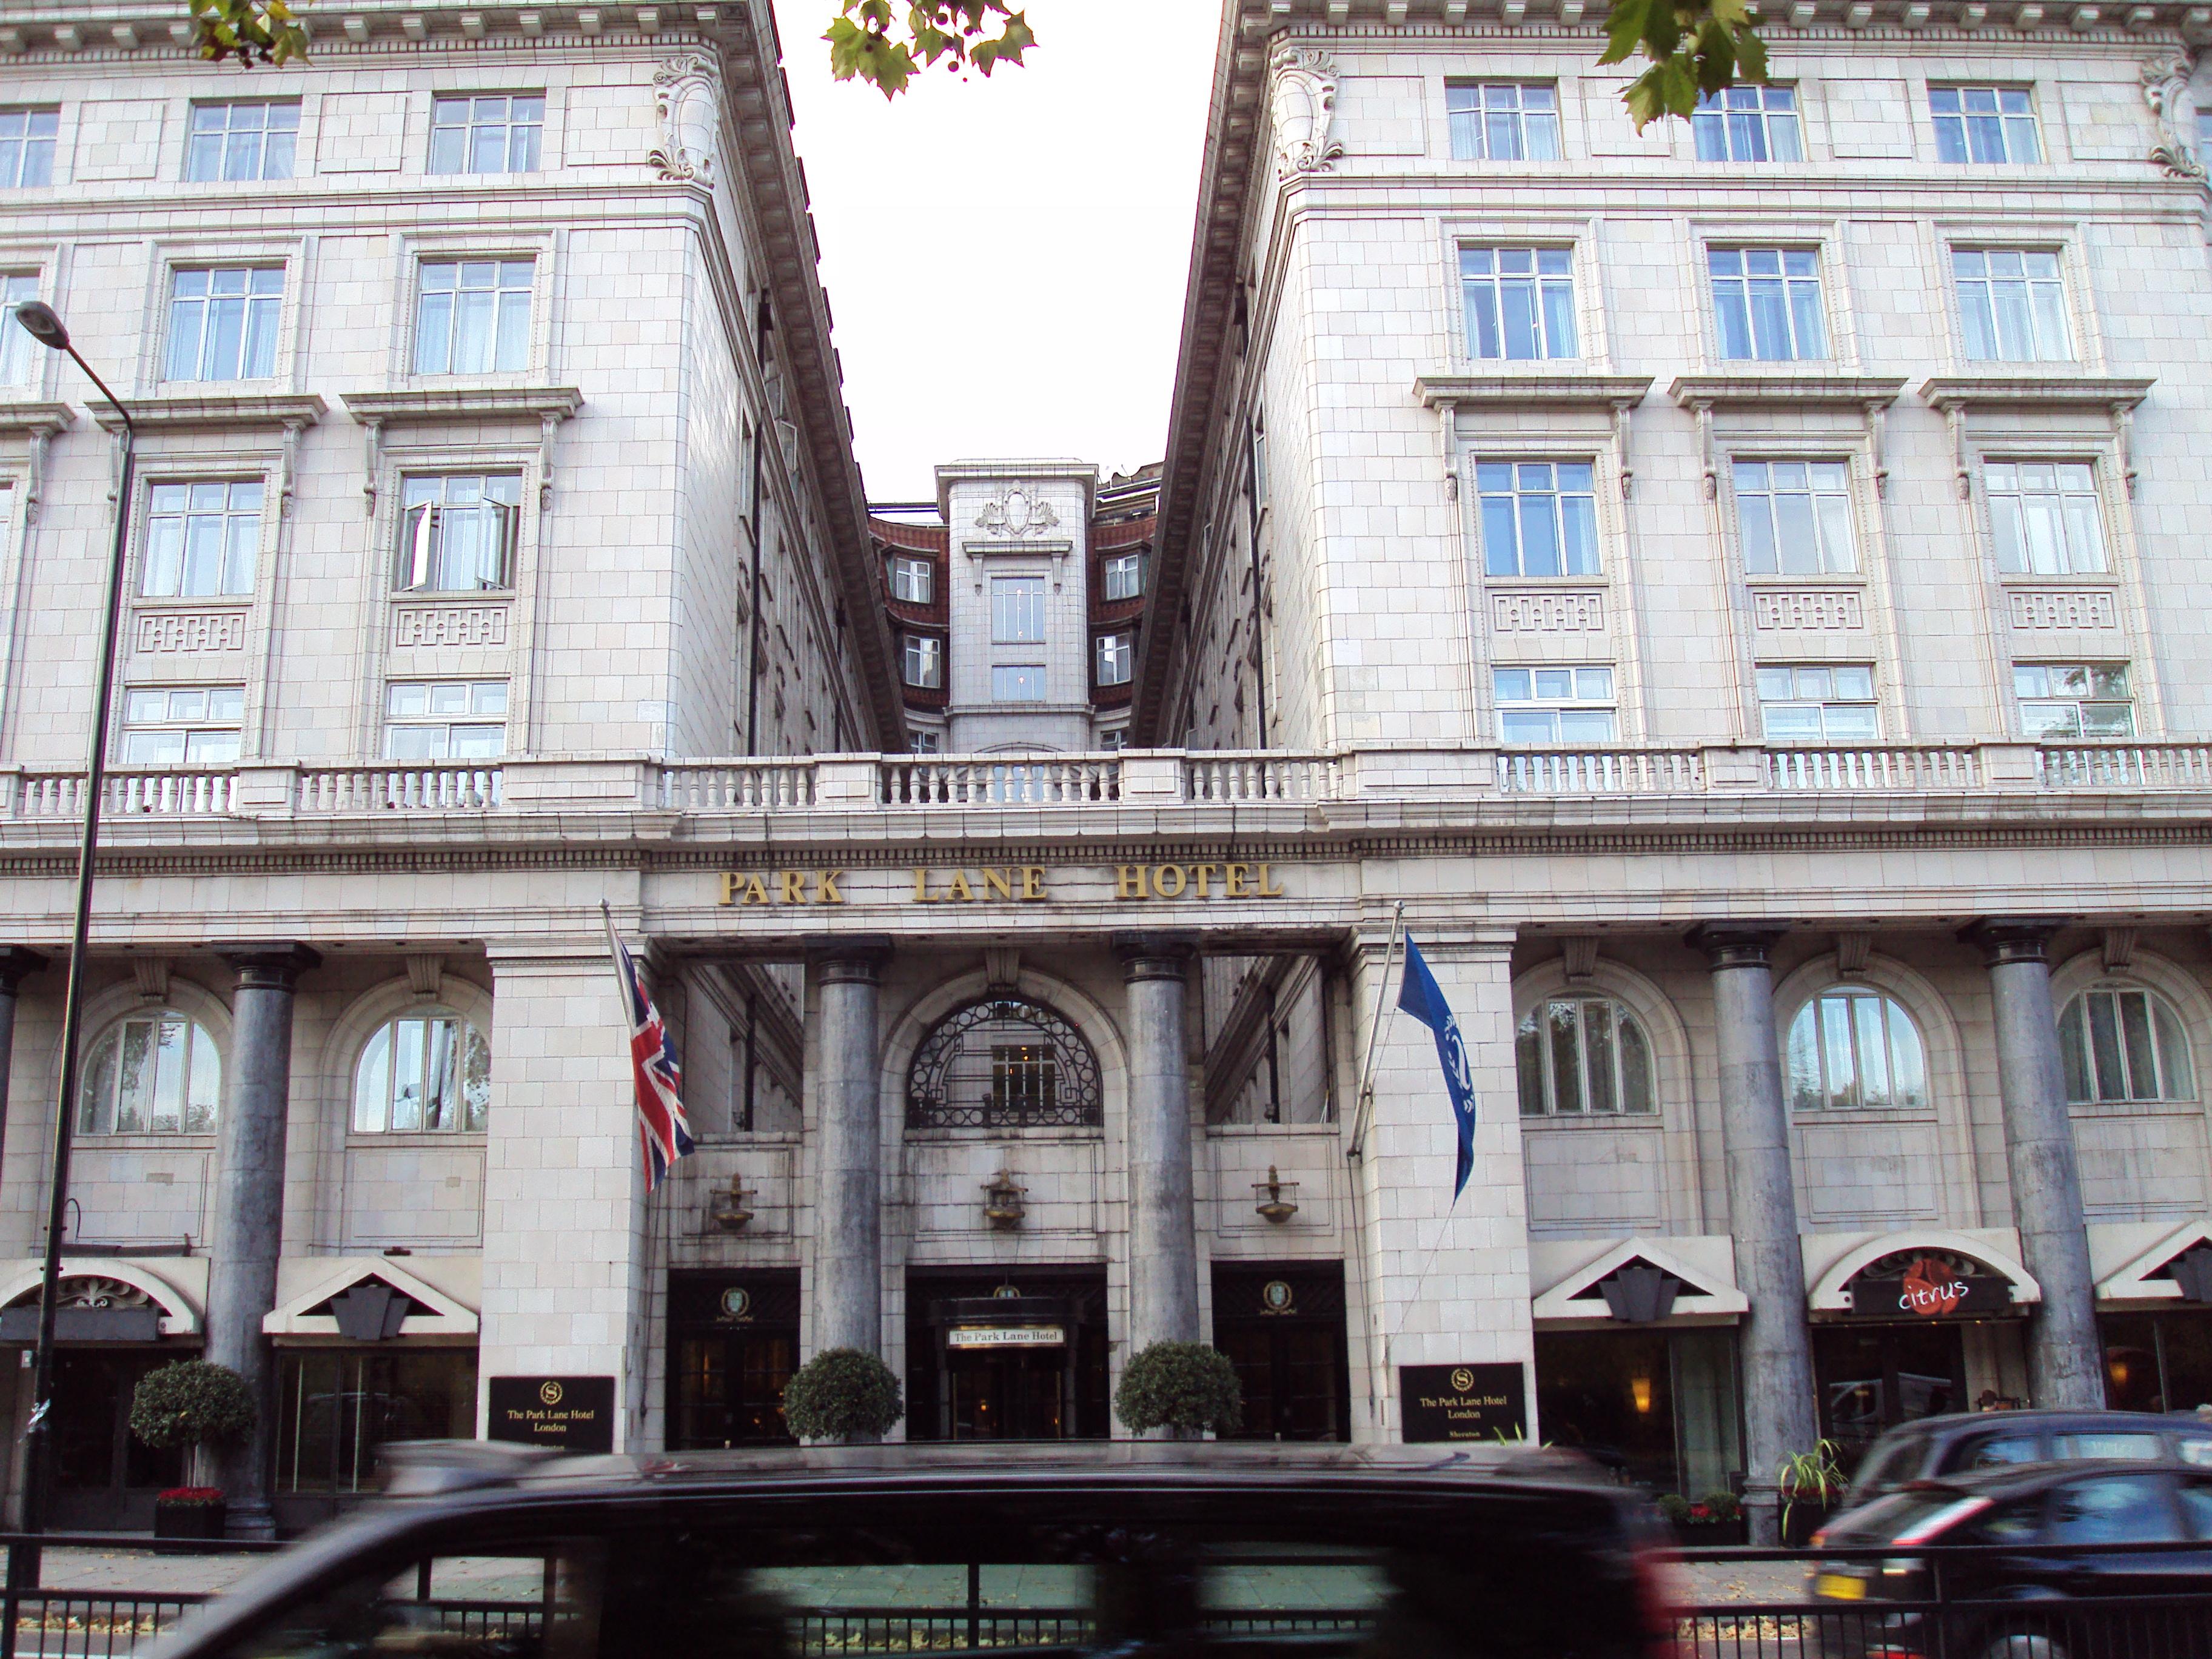 Park Lane Hotel Hk